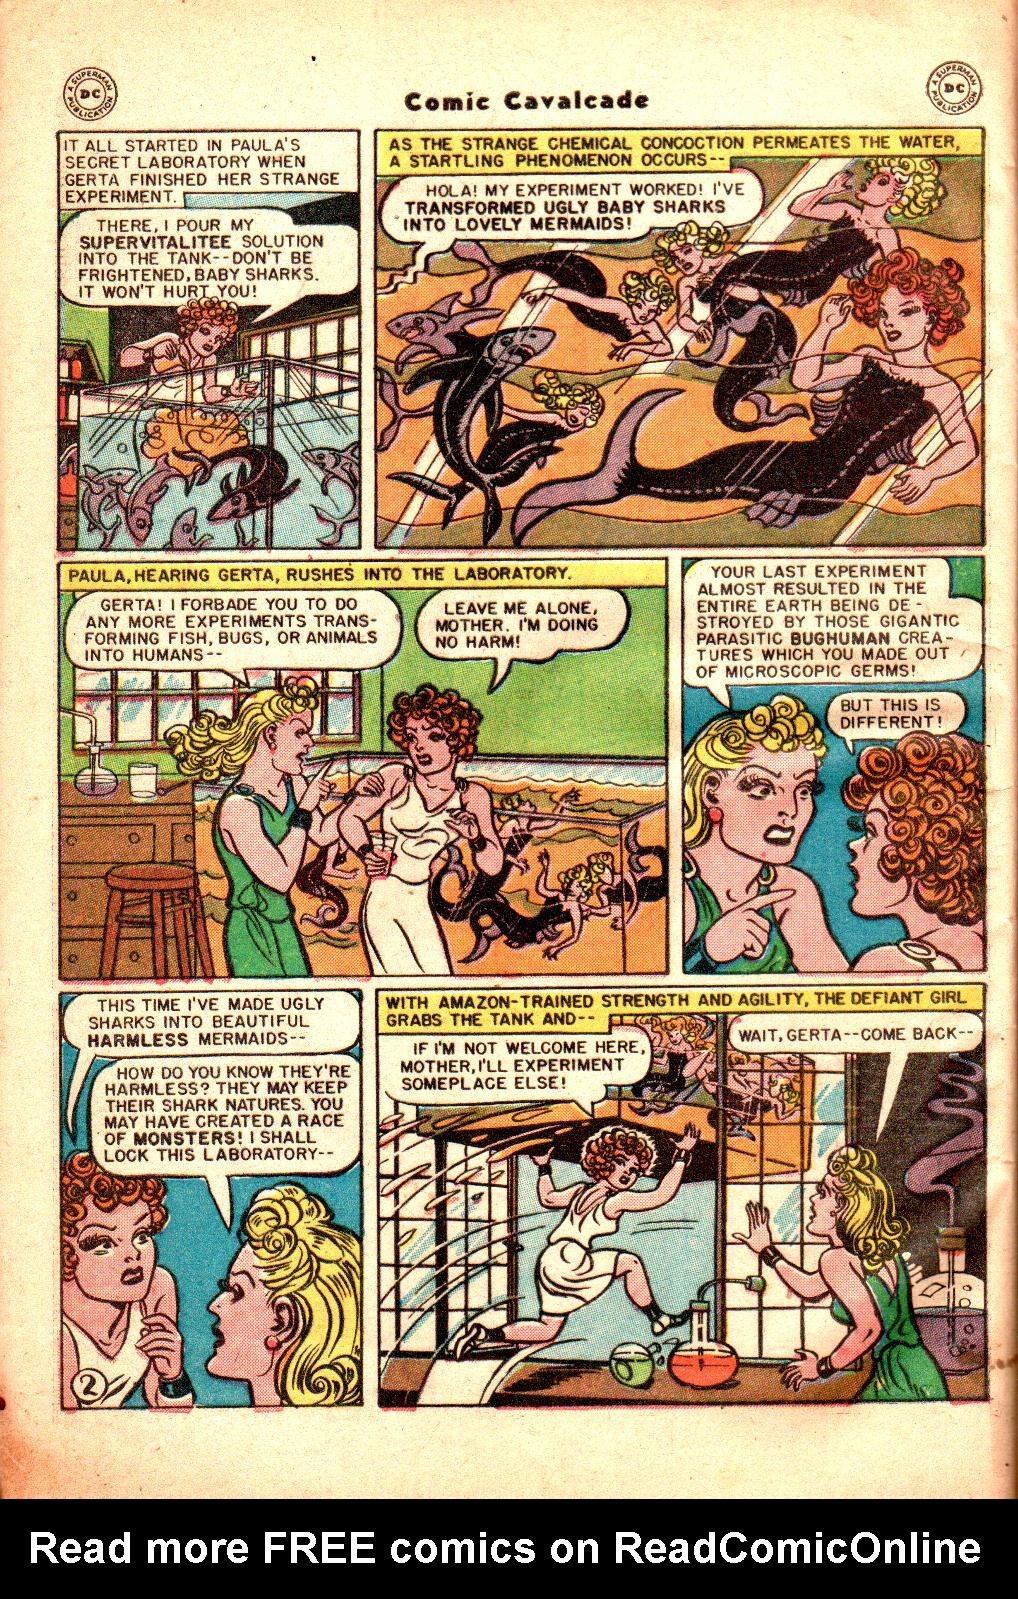 Comic Cavalcade issue 21 - Page 4